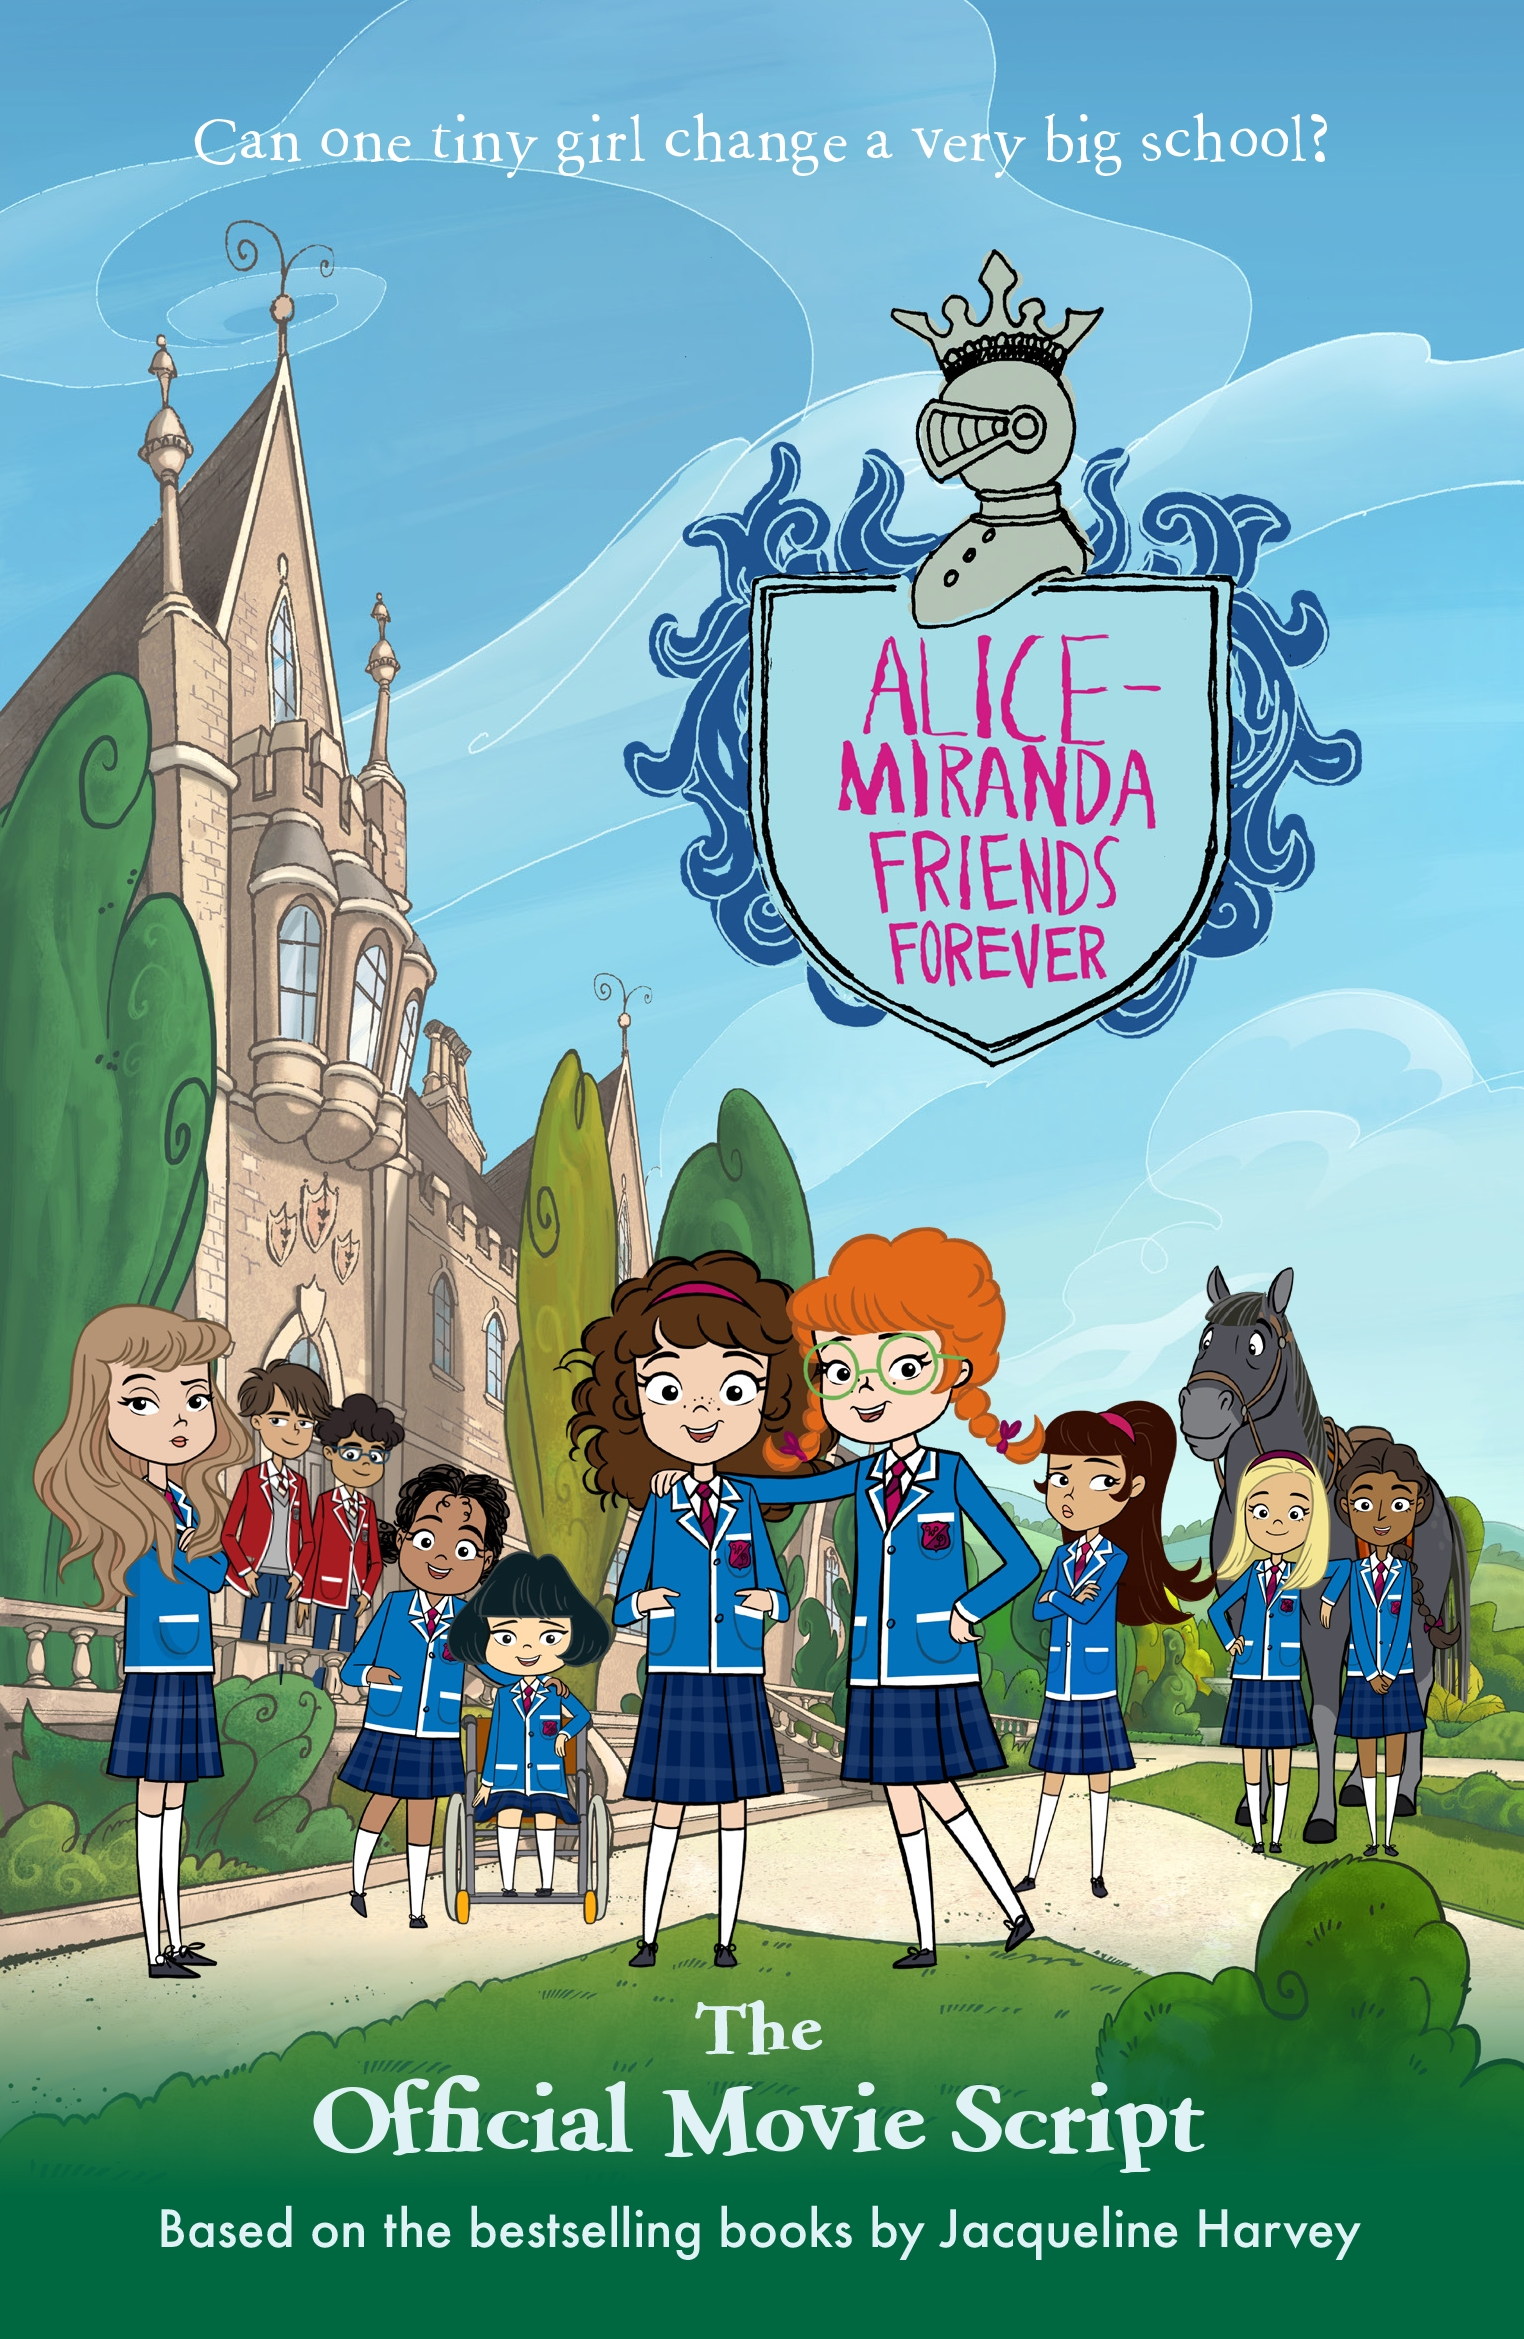 Alice-Miranda Friends Forever